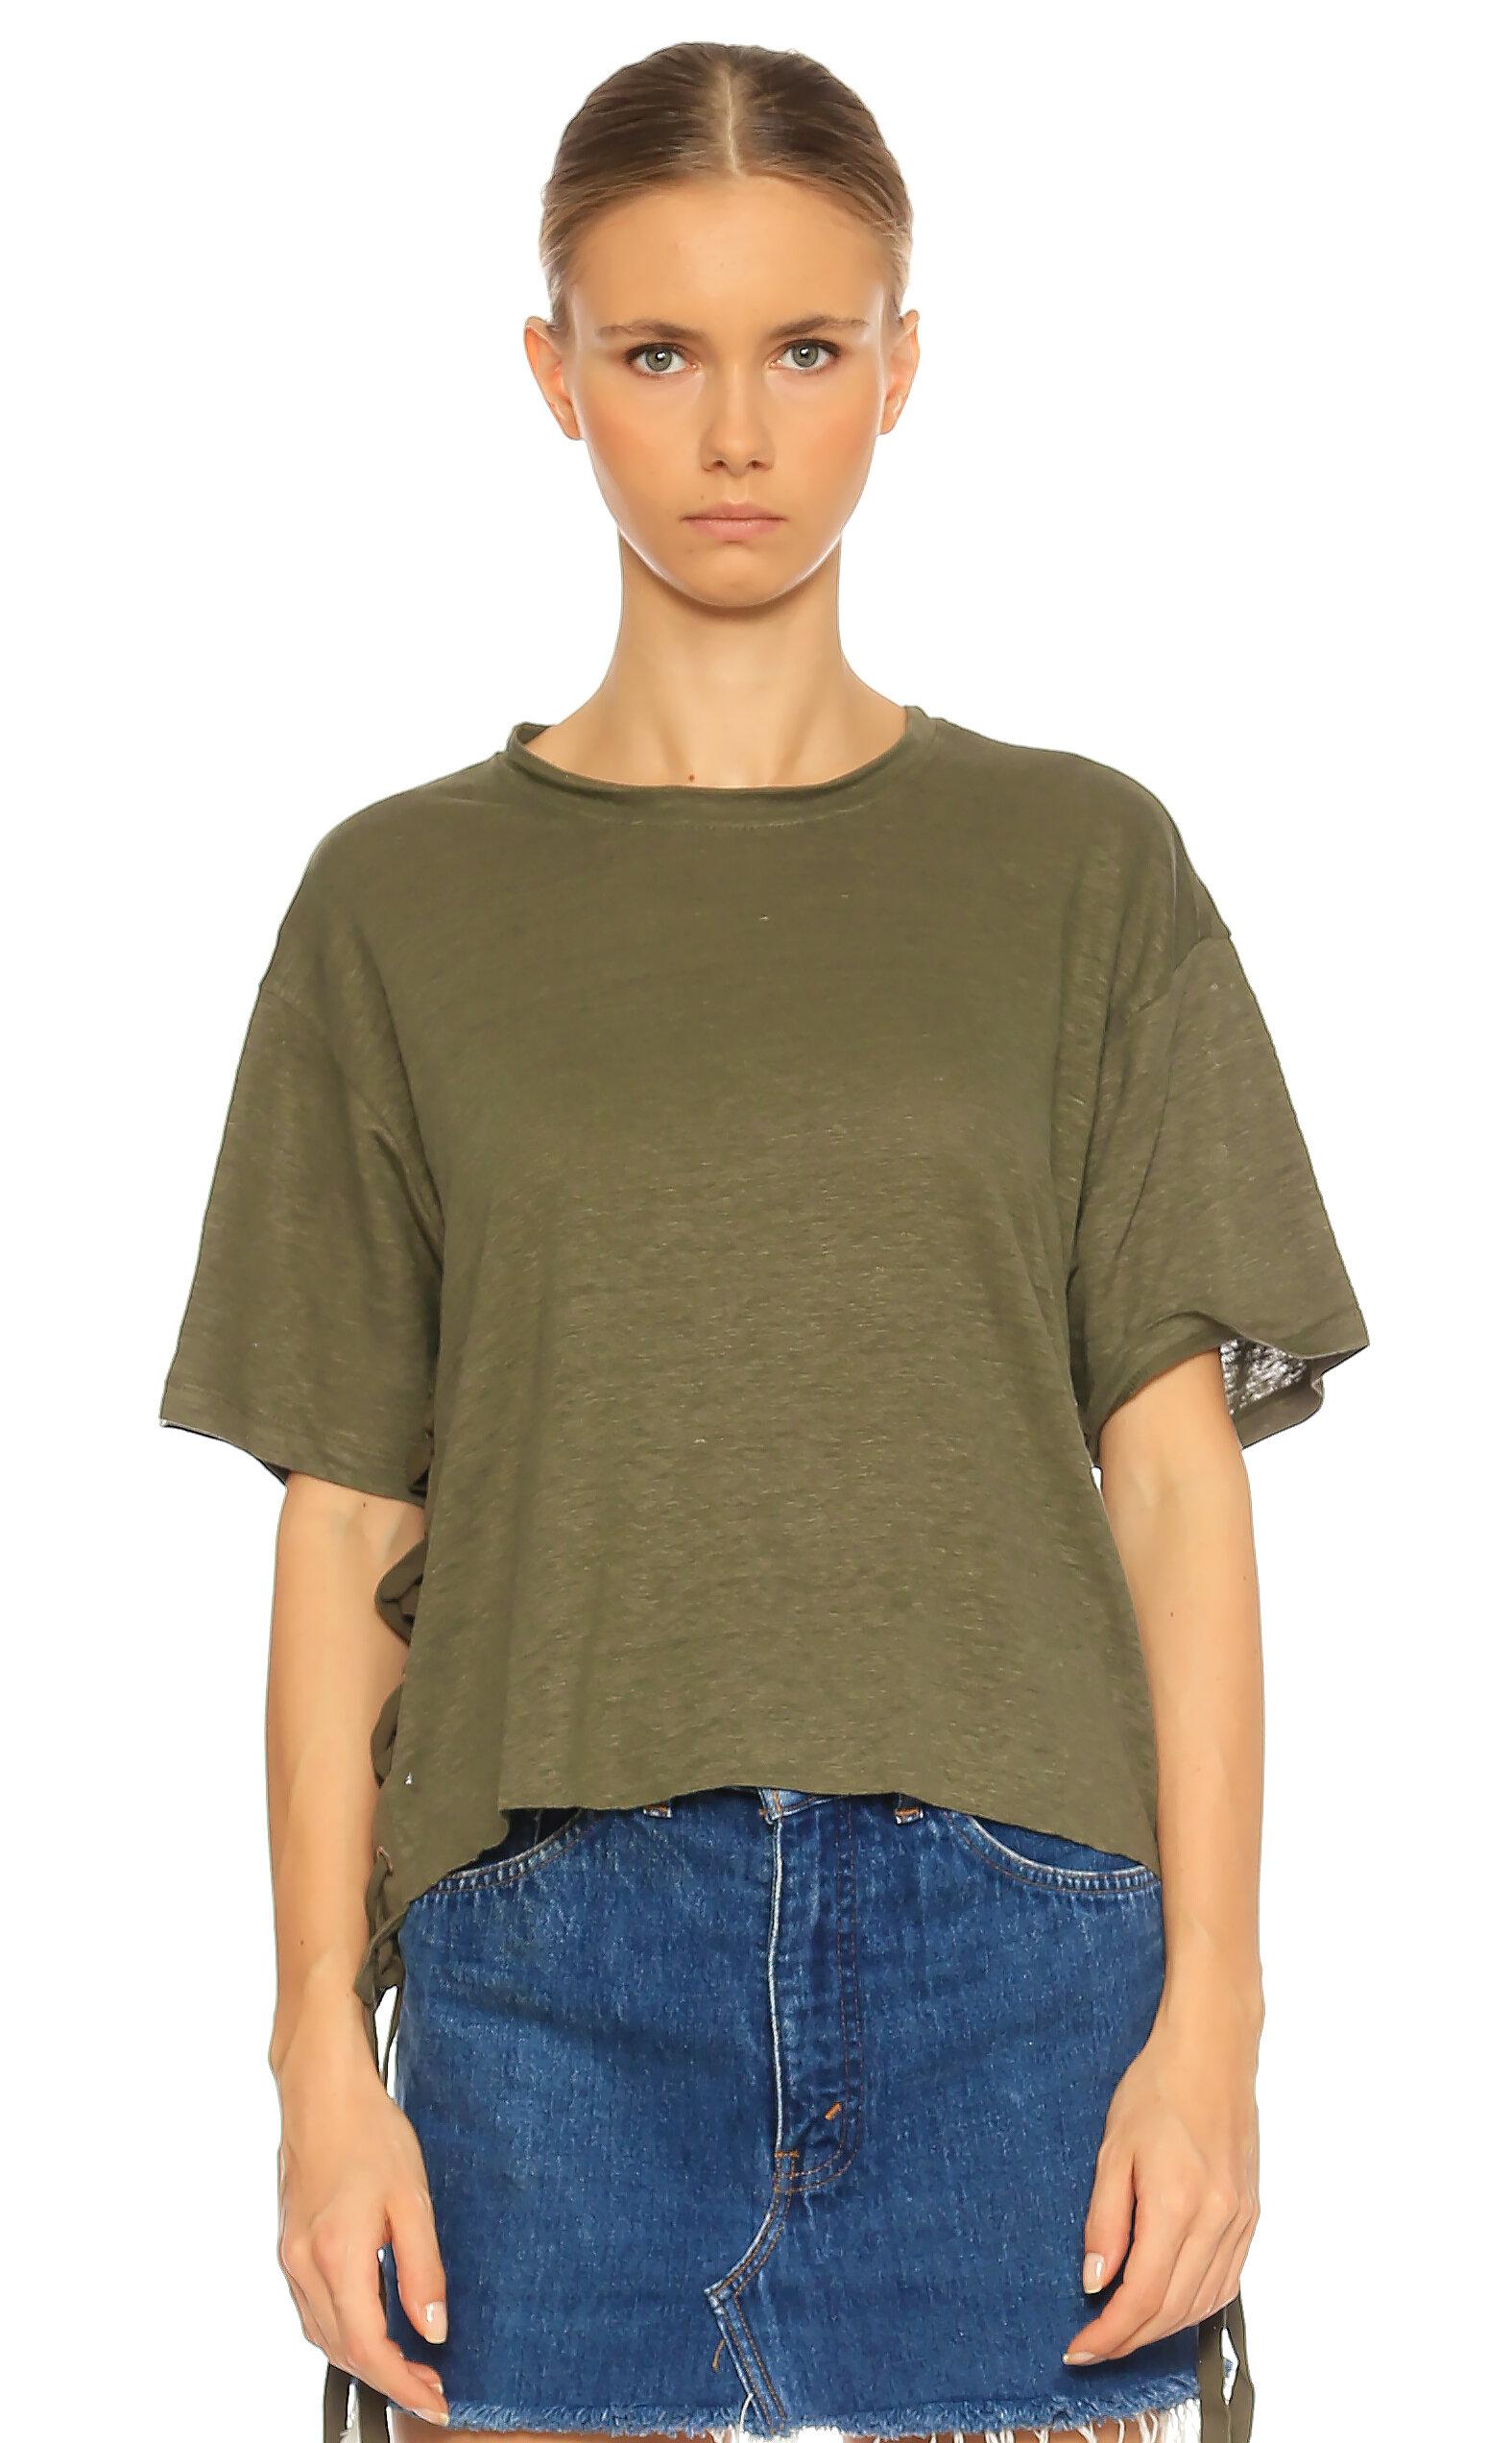 Kendall&Kylie-Kendall&Kylie Kısa Kollu Yeşil T-Shirt